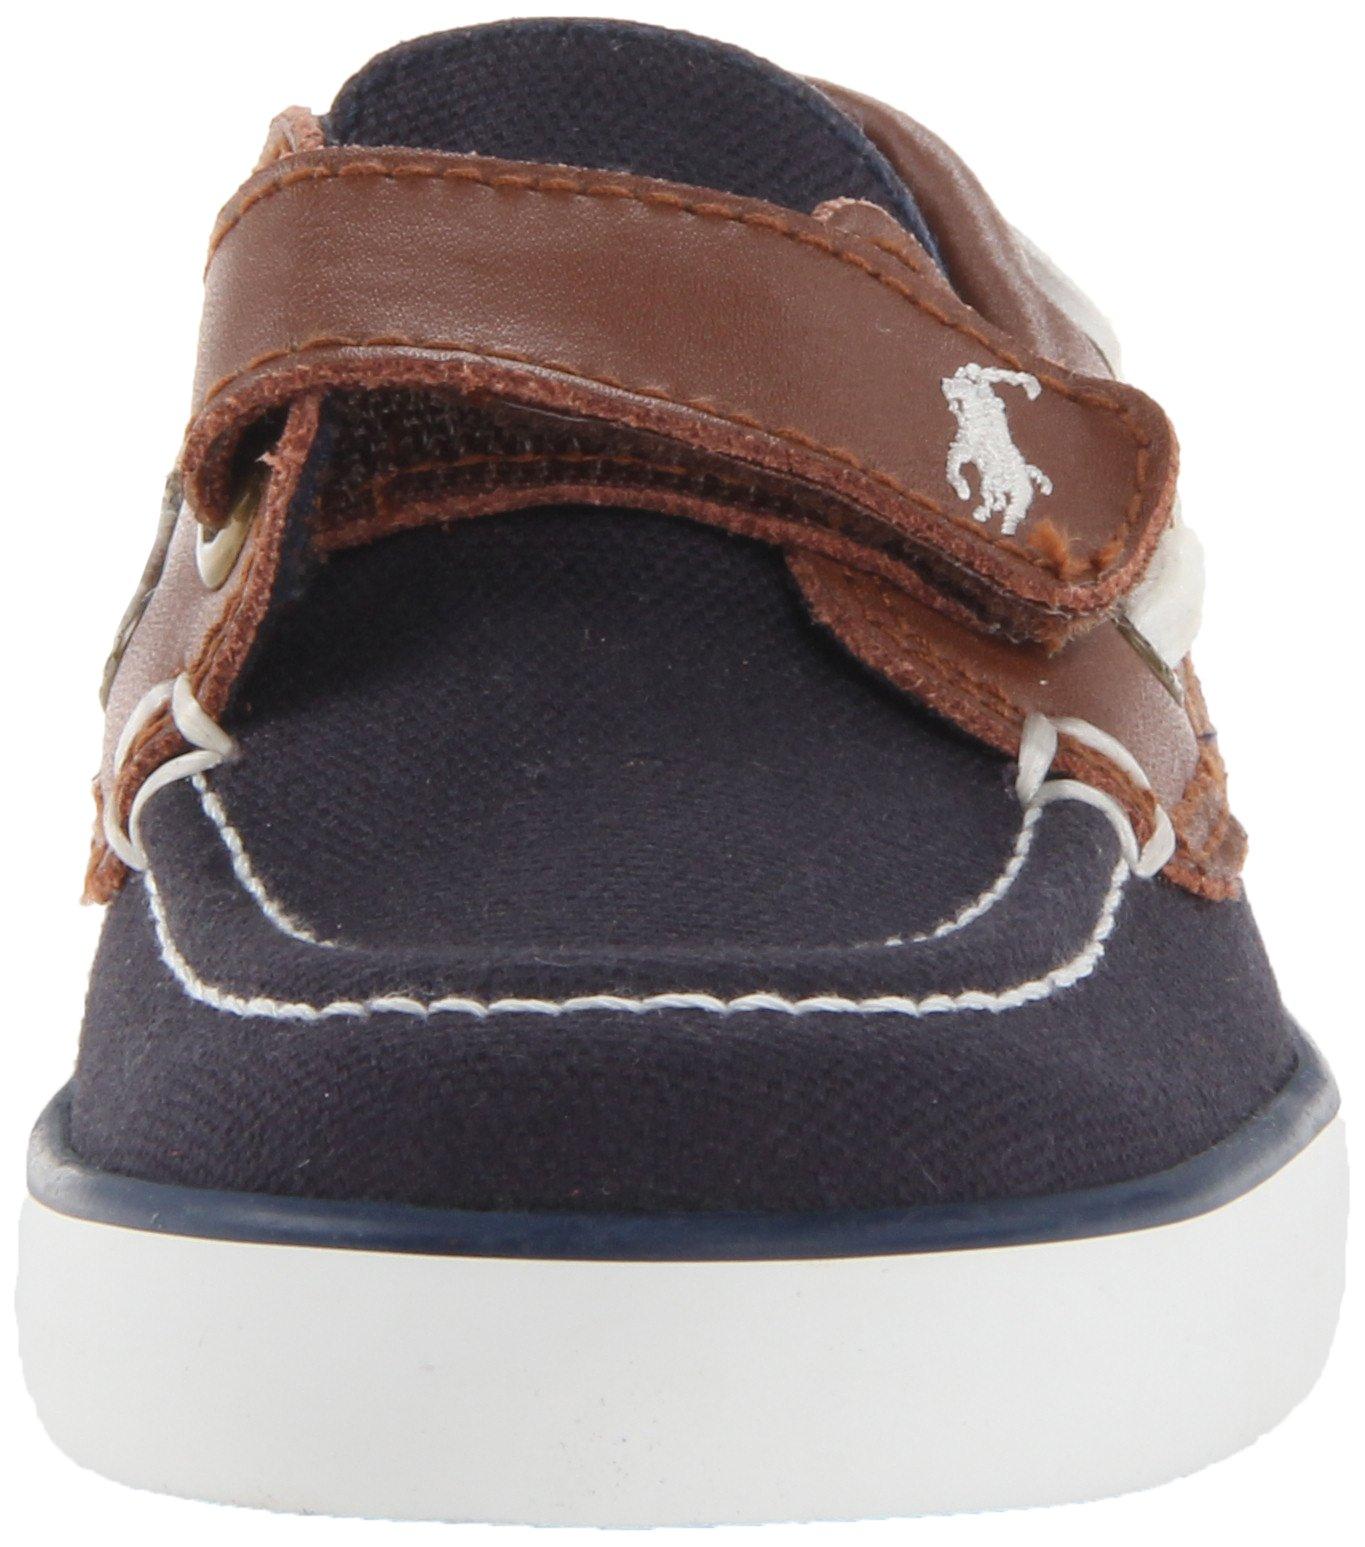 Polo Ralph Lauren Kids Sander-CL EZ Sneaker ,Navy,10.5 M US Little Kid by Polo Ralph Lauren (Image #4)